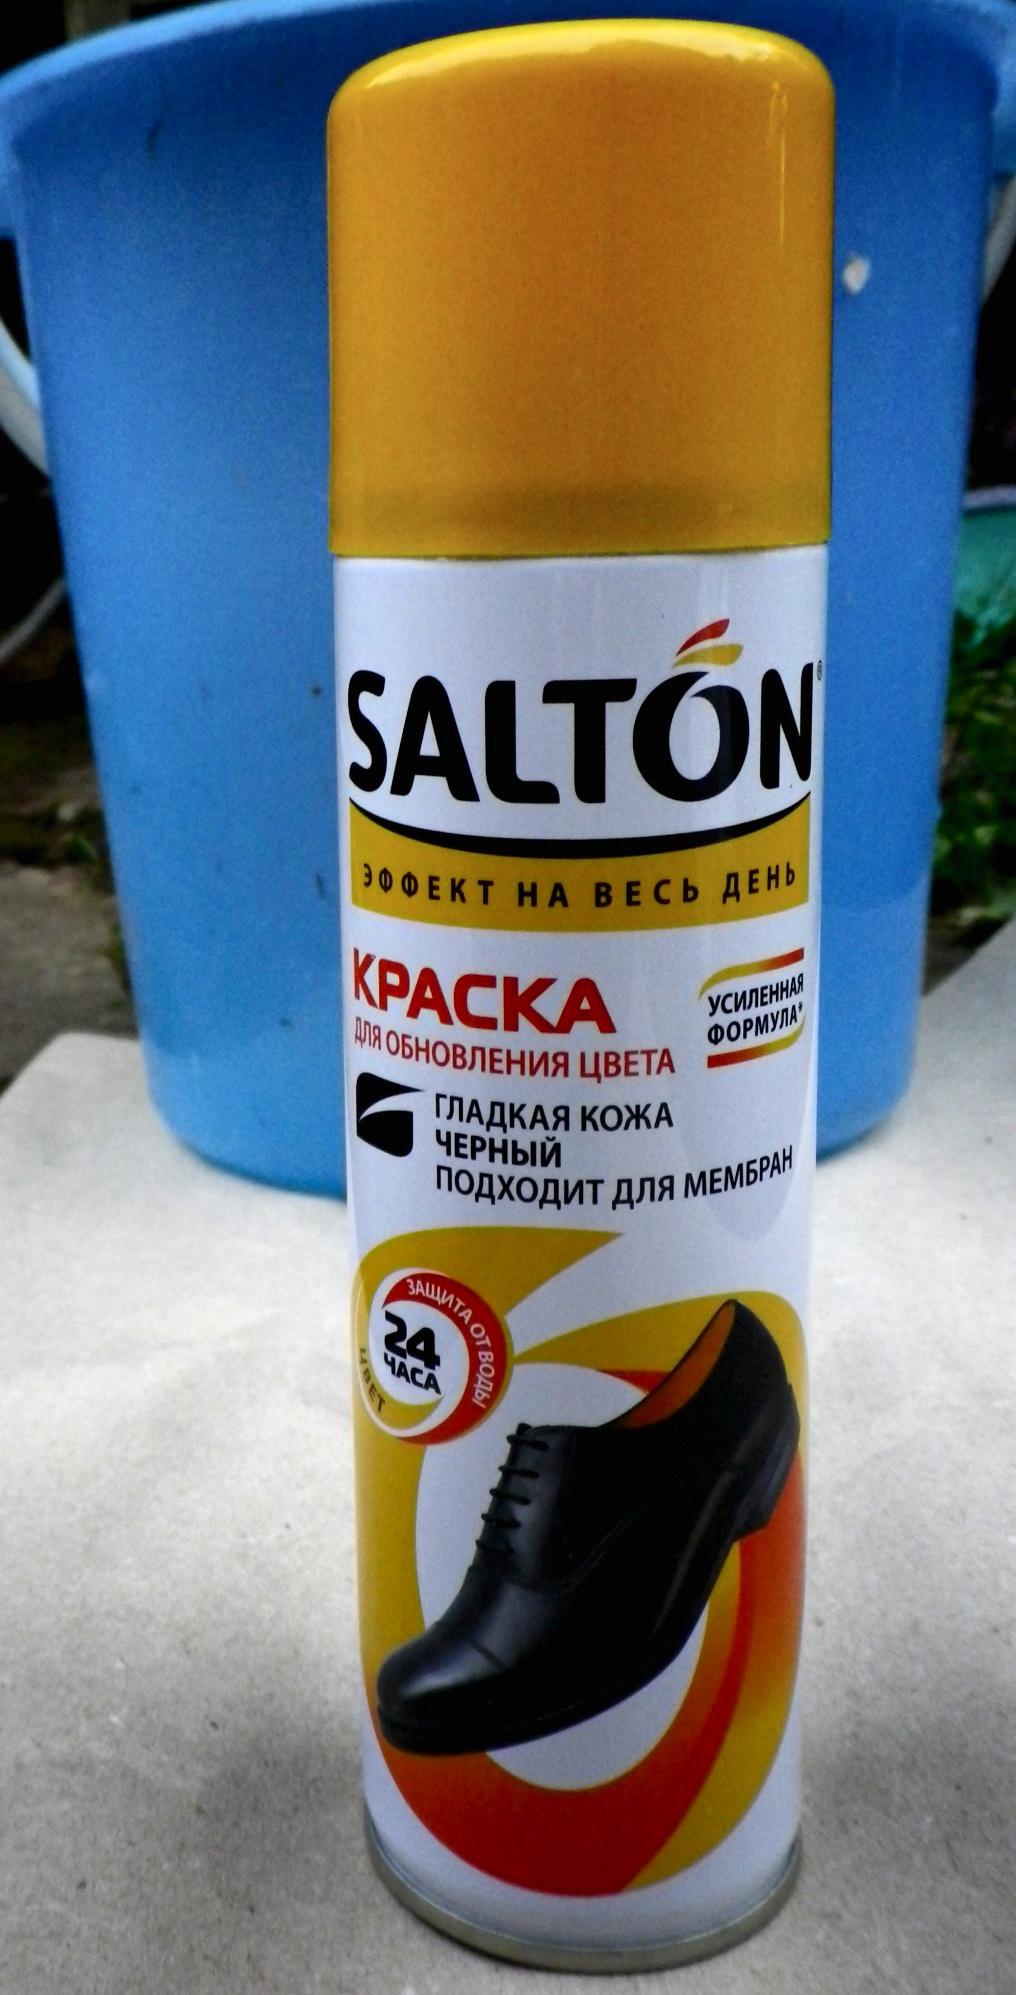 fea93d5f51ef Обзор на Краска для обуви SALTON для гладкой кожи, черная, 250мл -  изображение 1